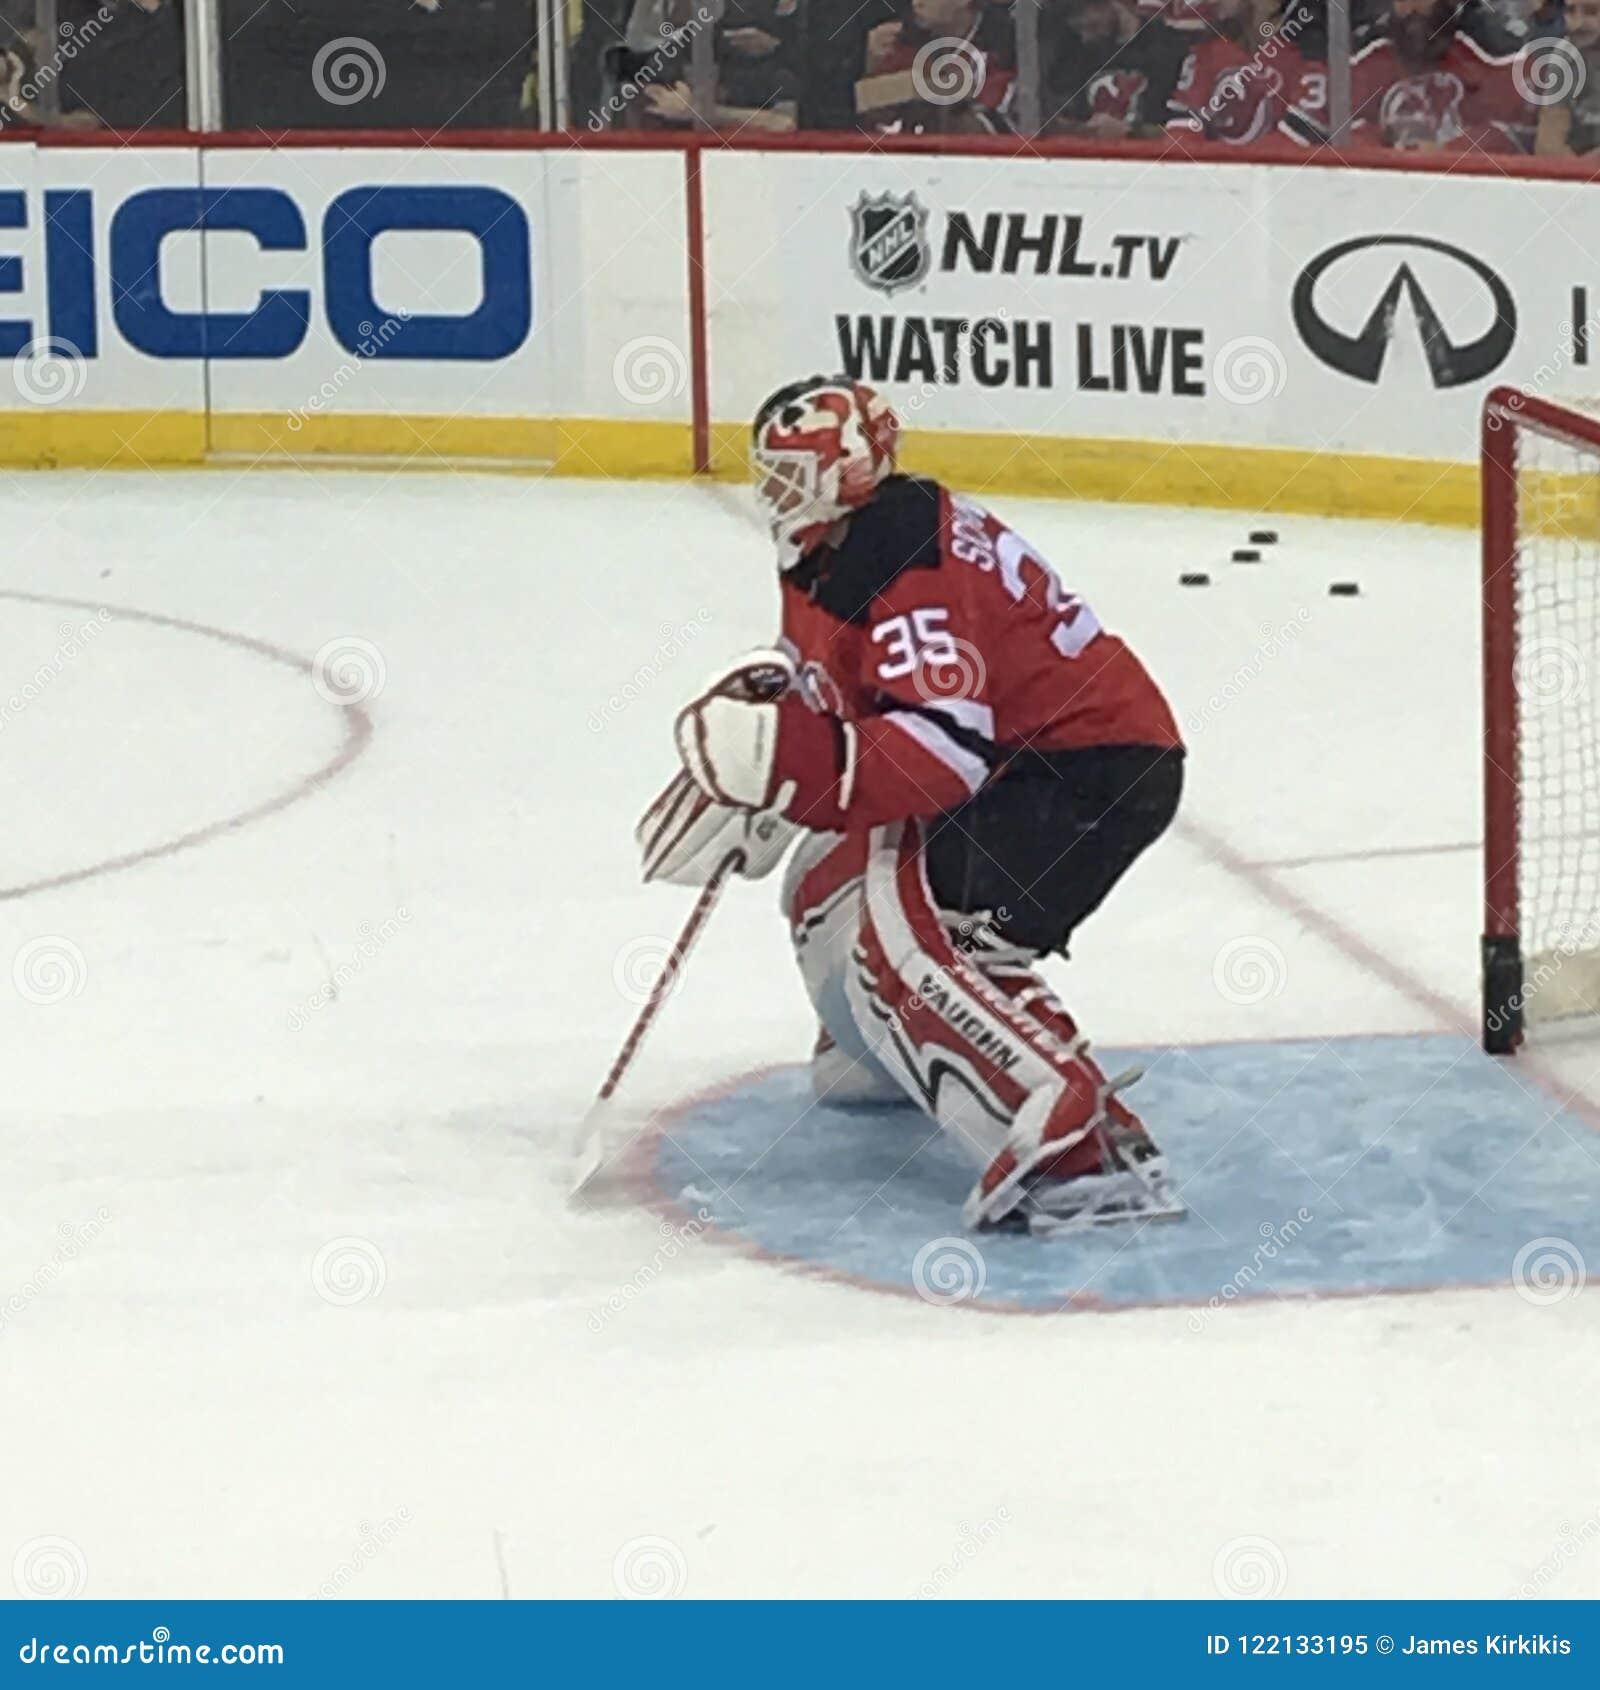 info for b7257 bb0cb Corey Schneider, New Jersey Devils Editorial Image - Image ...